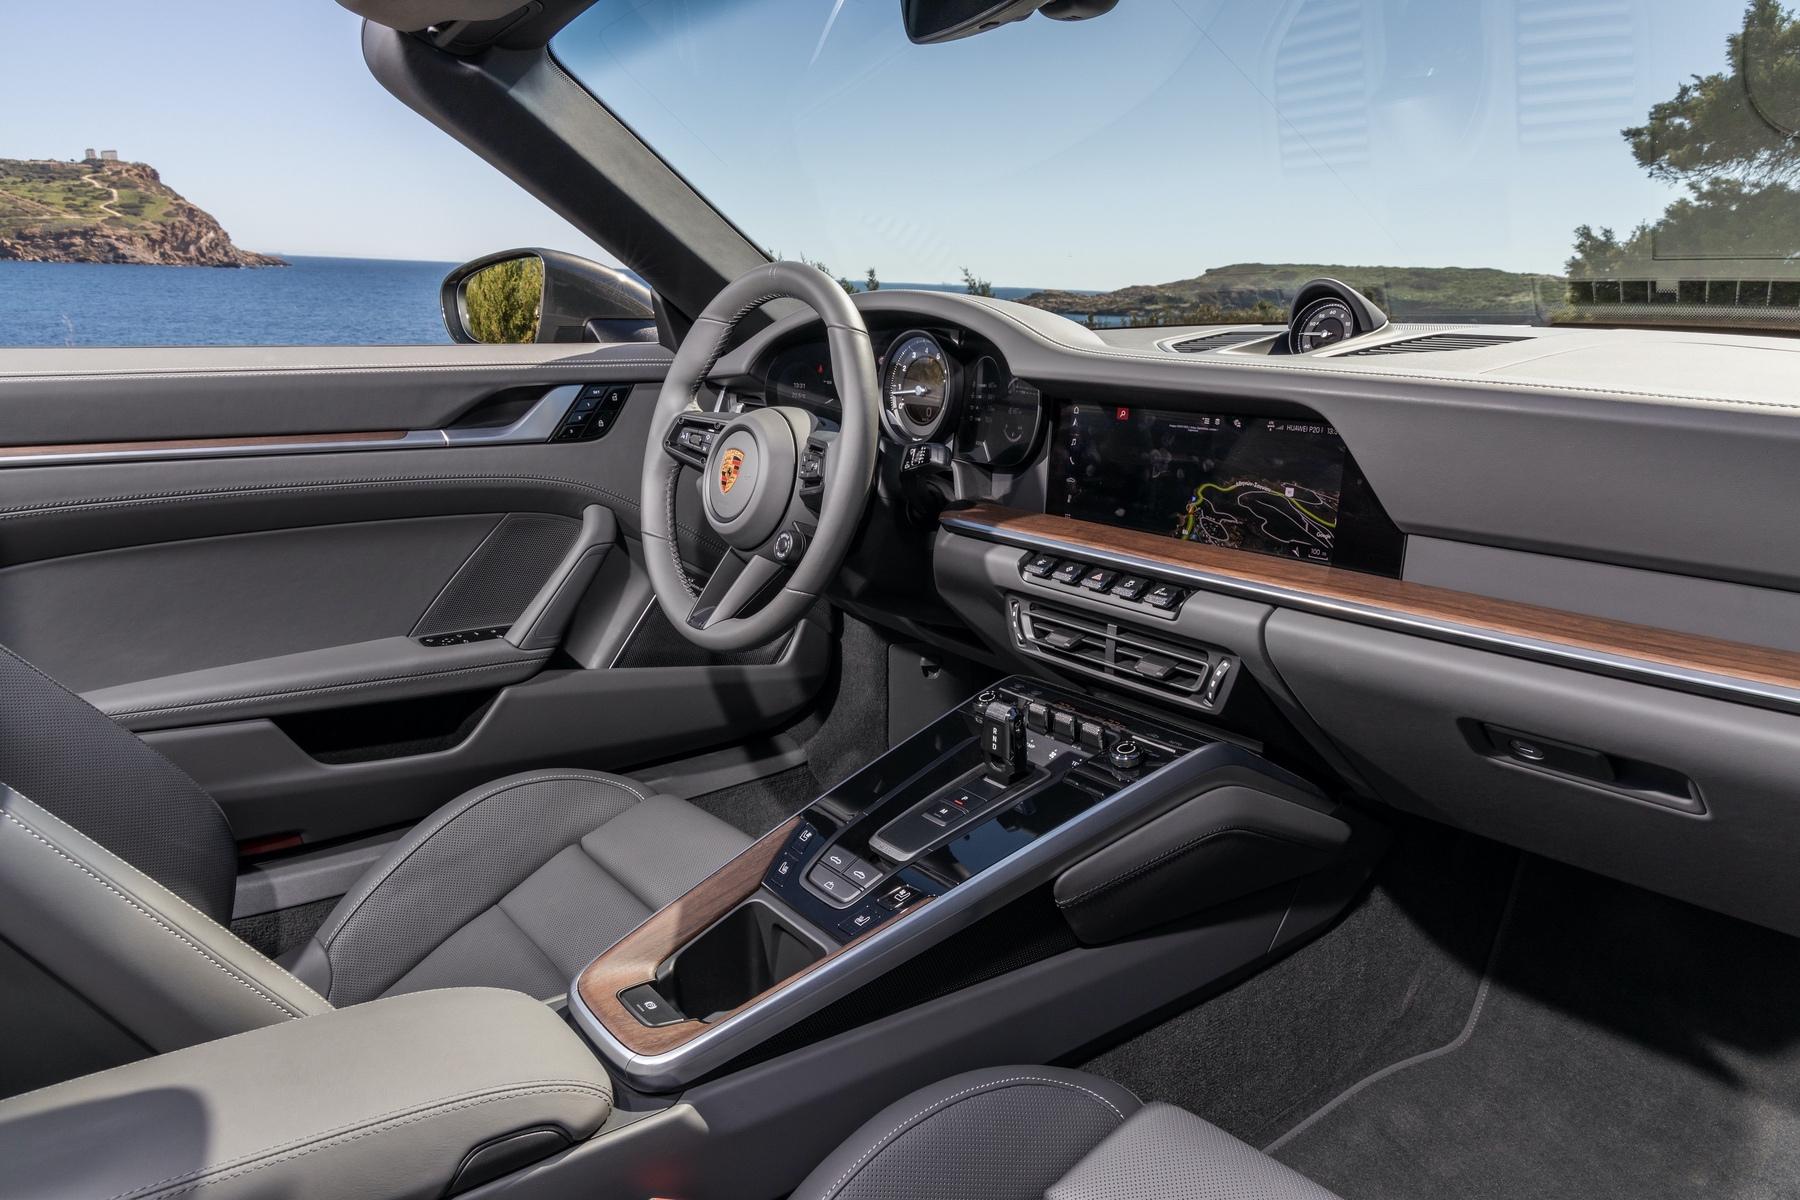 Test_Drive_Porsche_911_Athens_0209